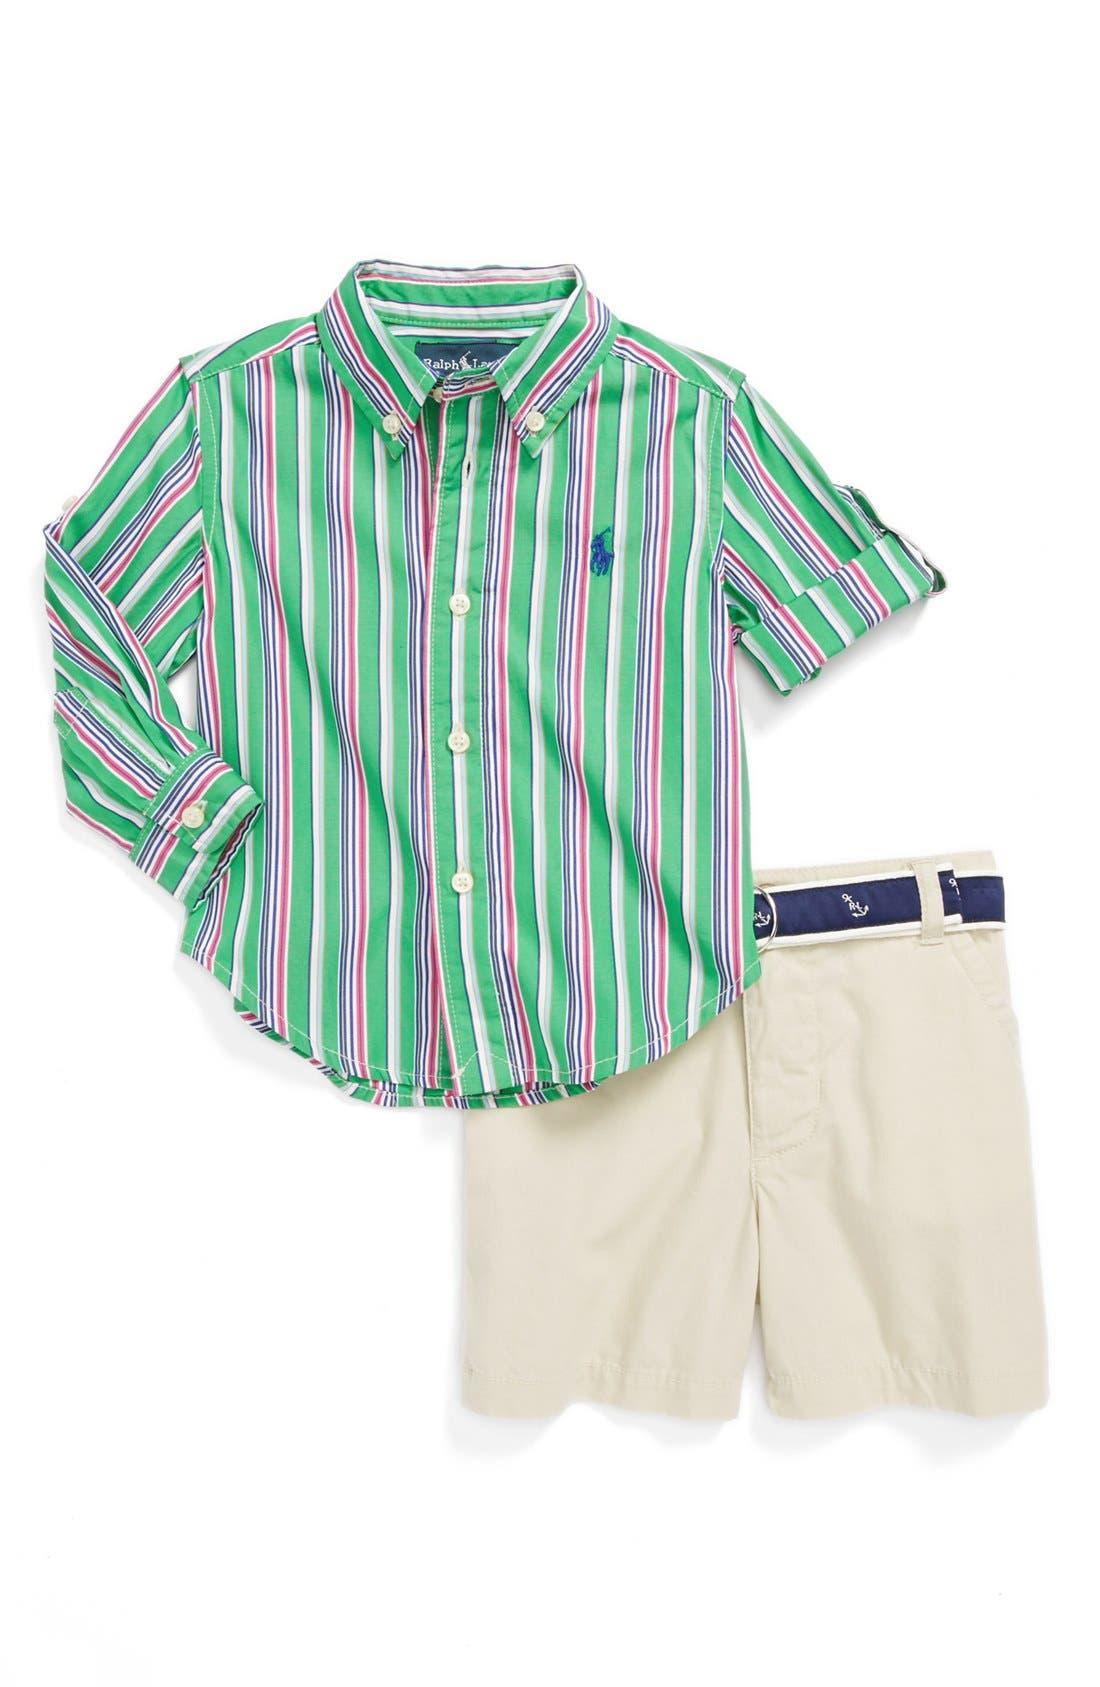 Main Image - Ralph Lauren Woven Shirt & Shorts (Baby Boys)